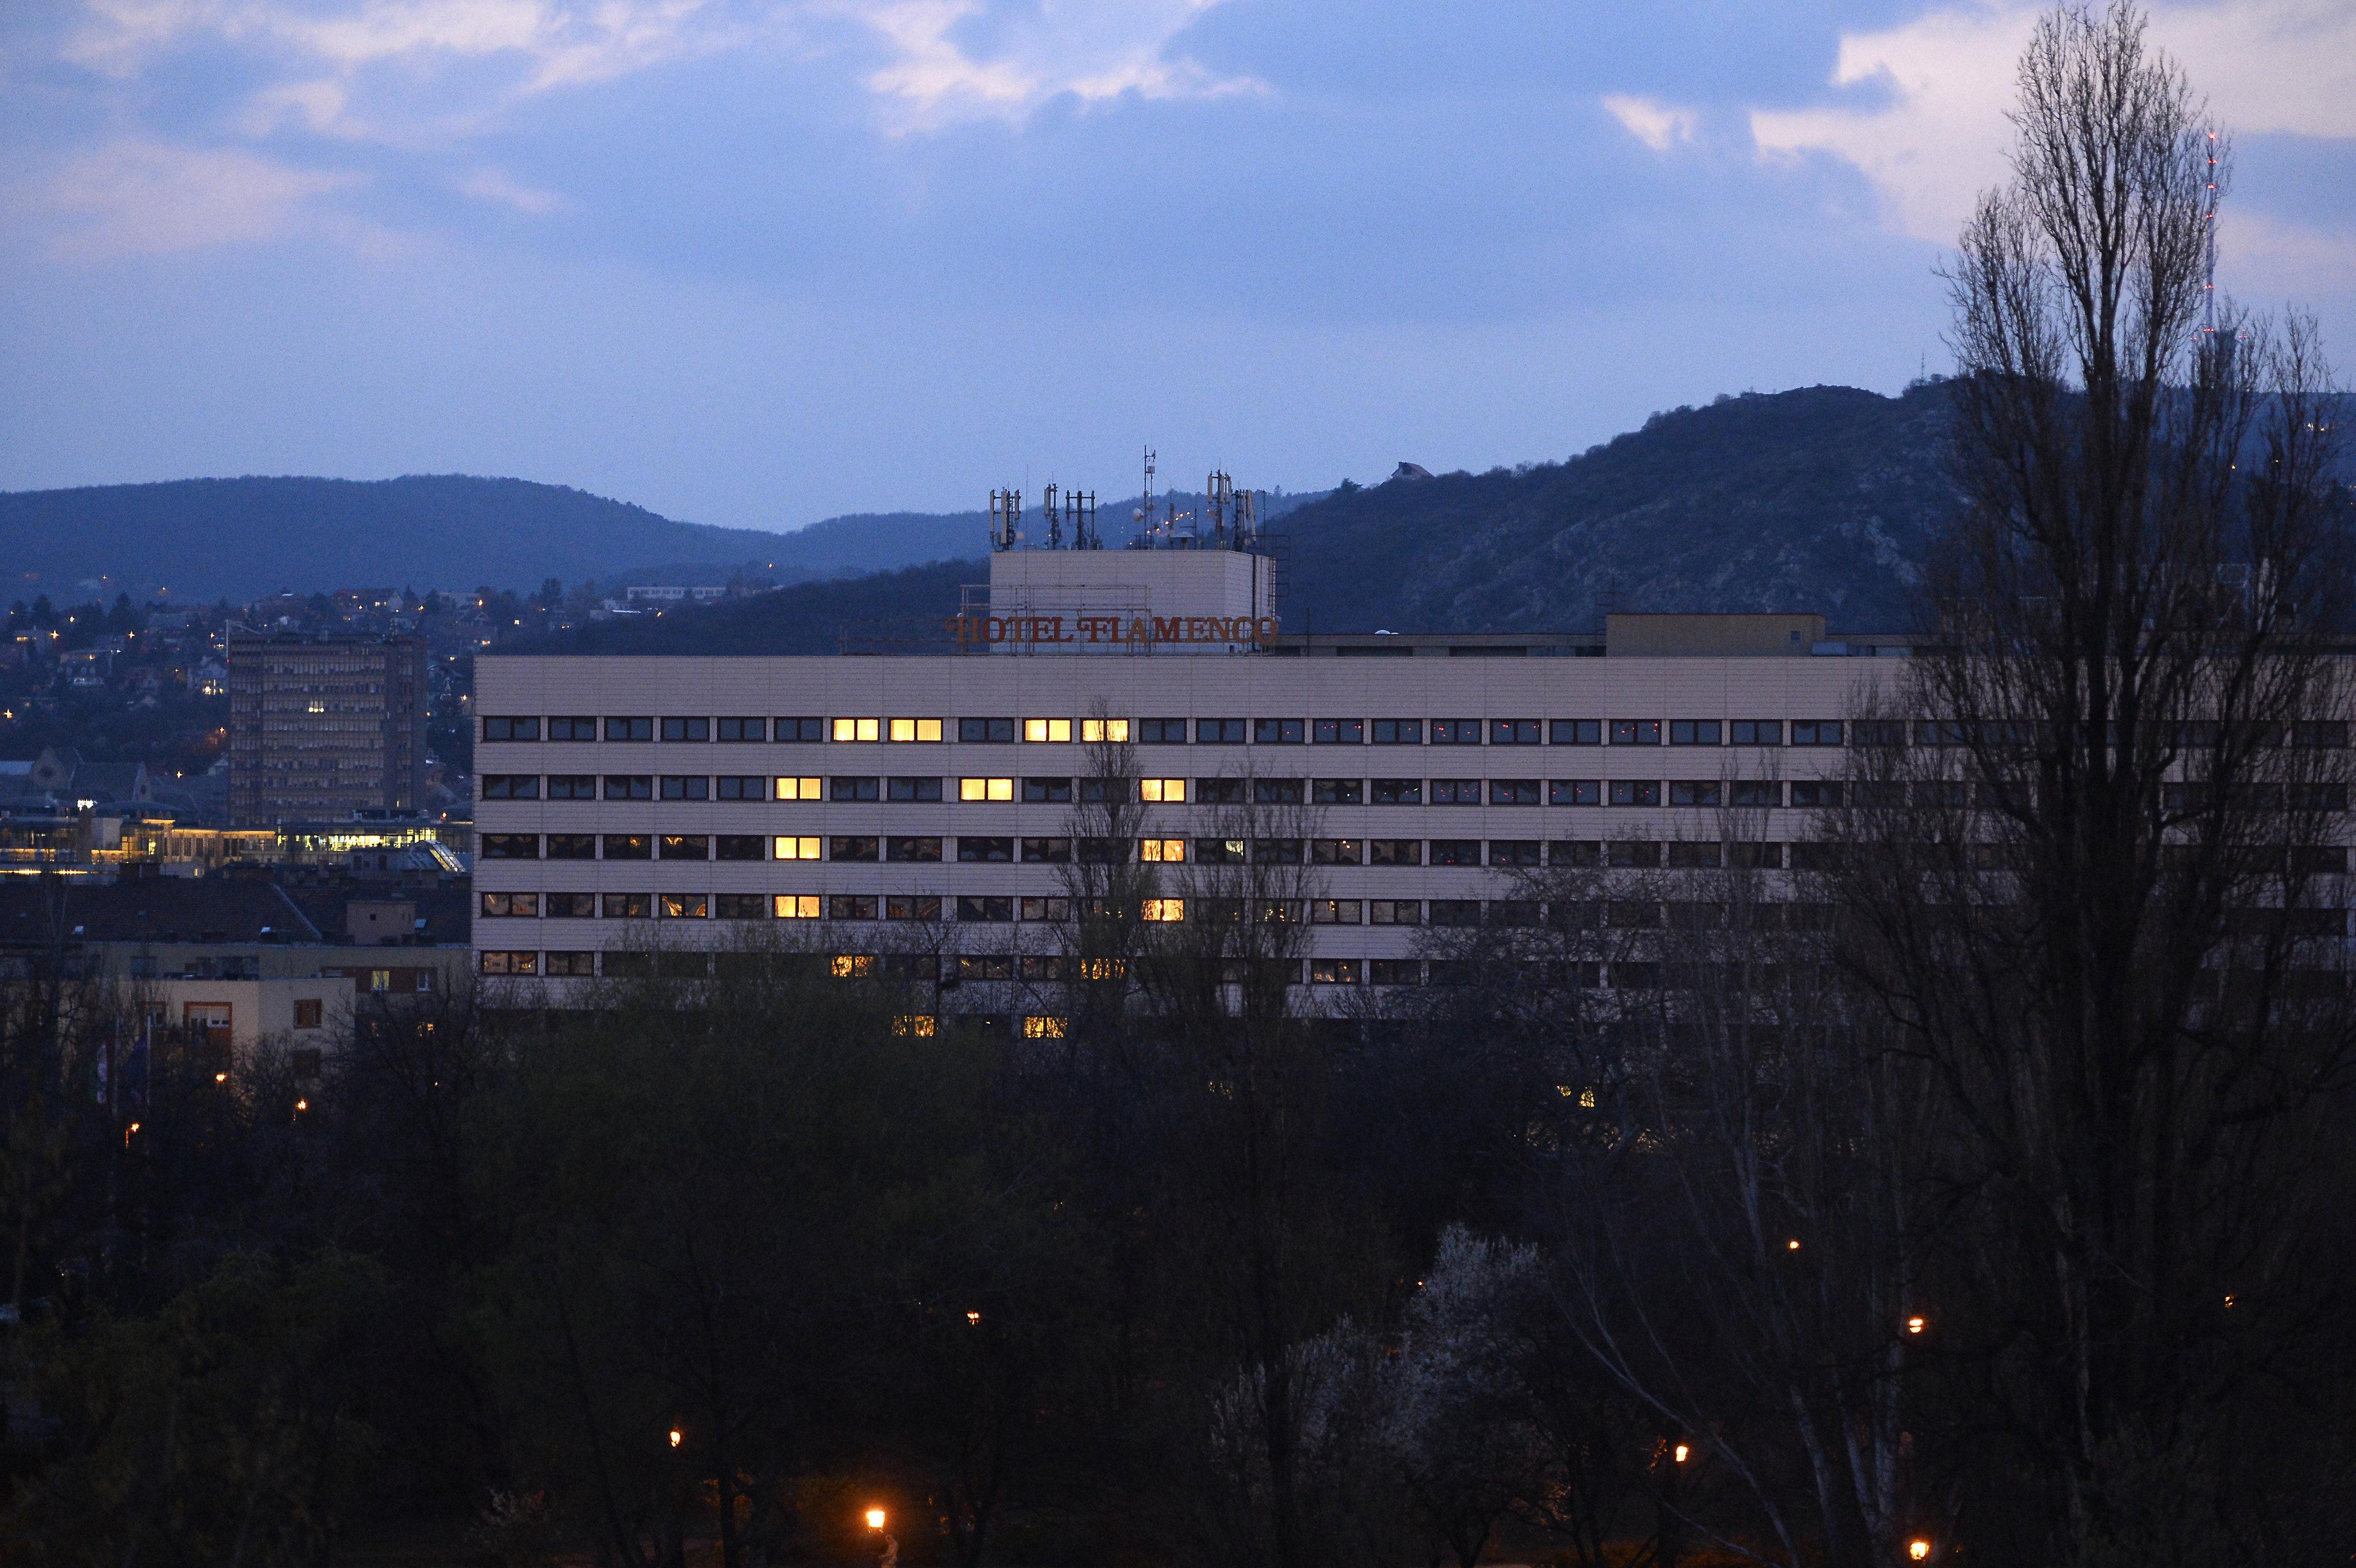 Coronavirus: Knapp 5% der ungarischen Hotels geöffnet post's picture